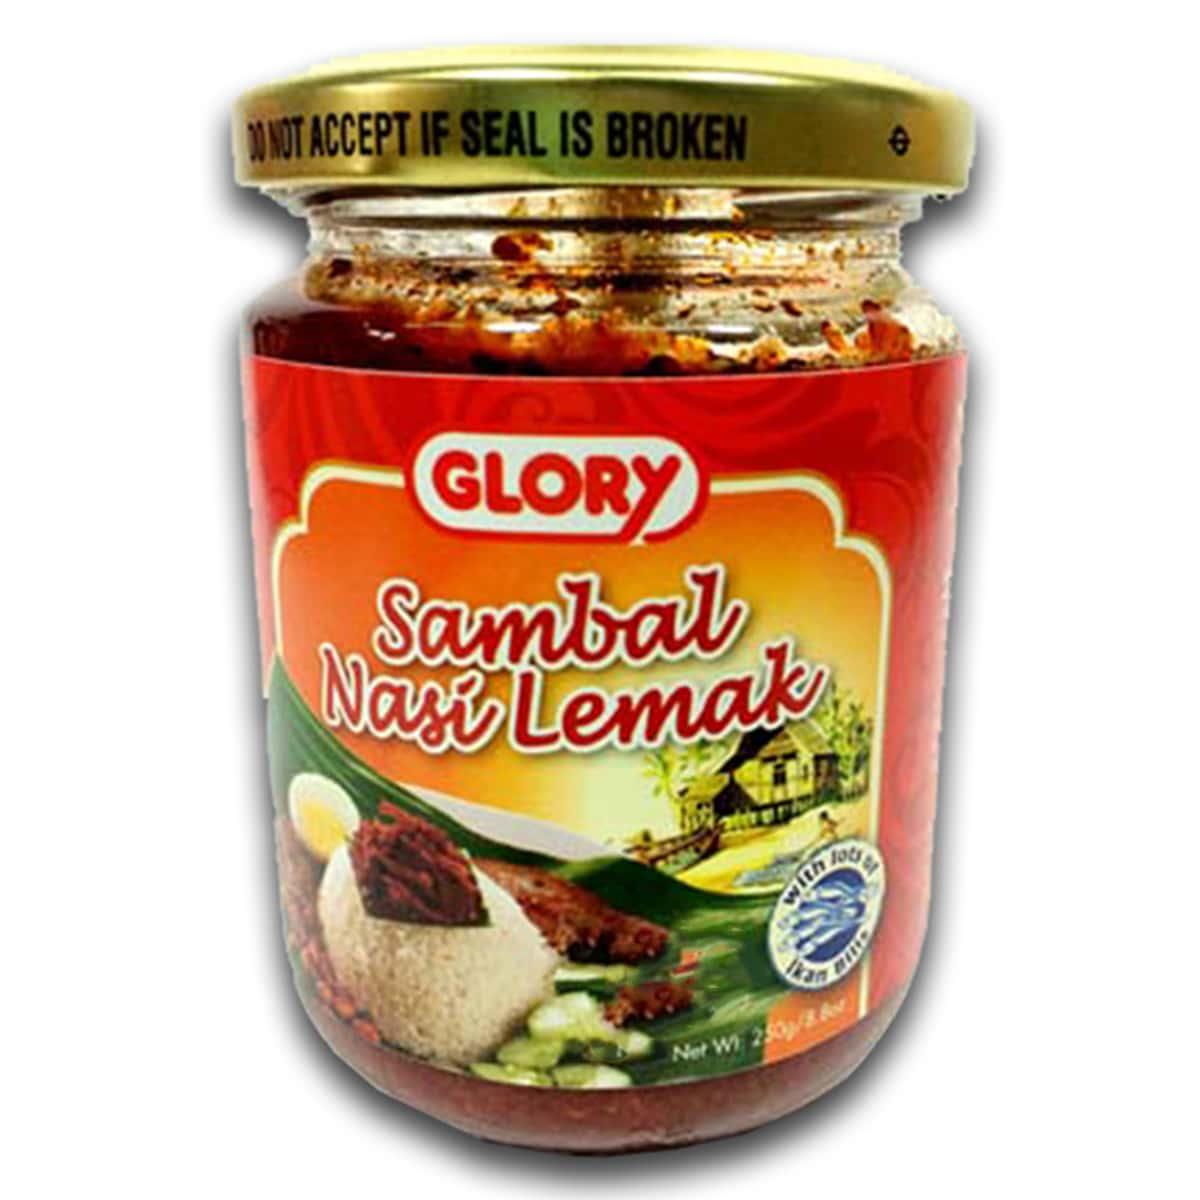 Buy Glory Sambal Nasi Lemak - 250 gm